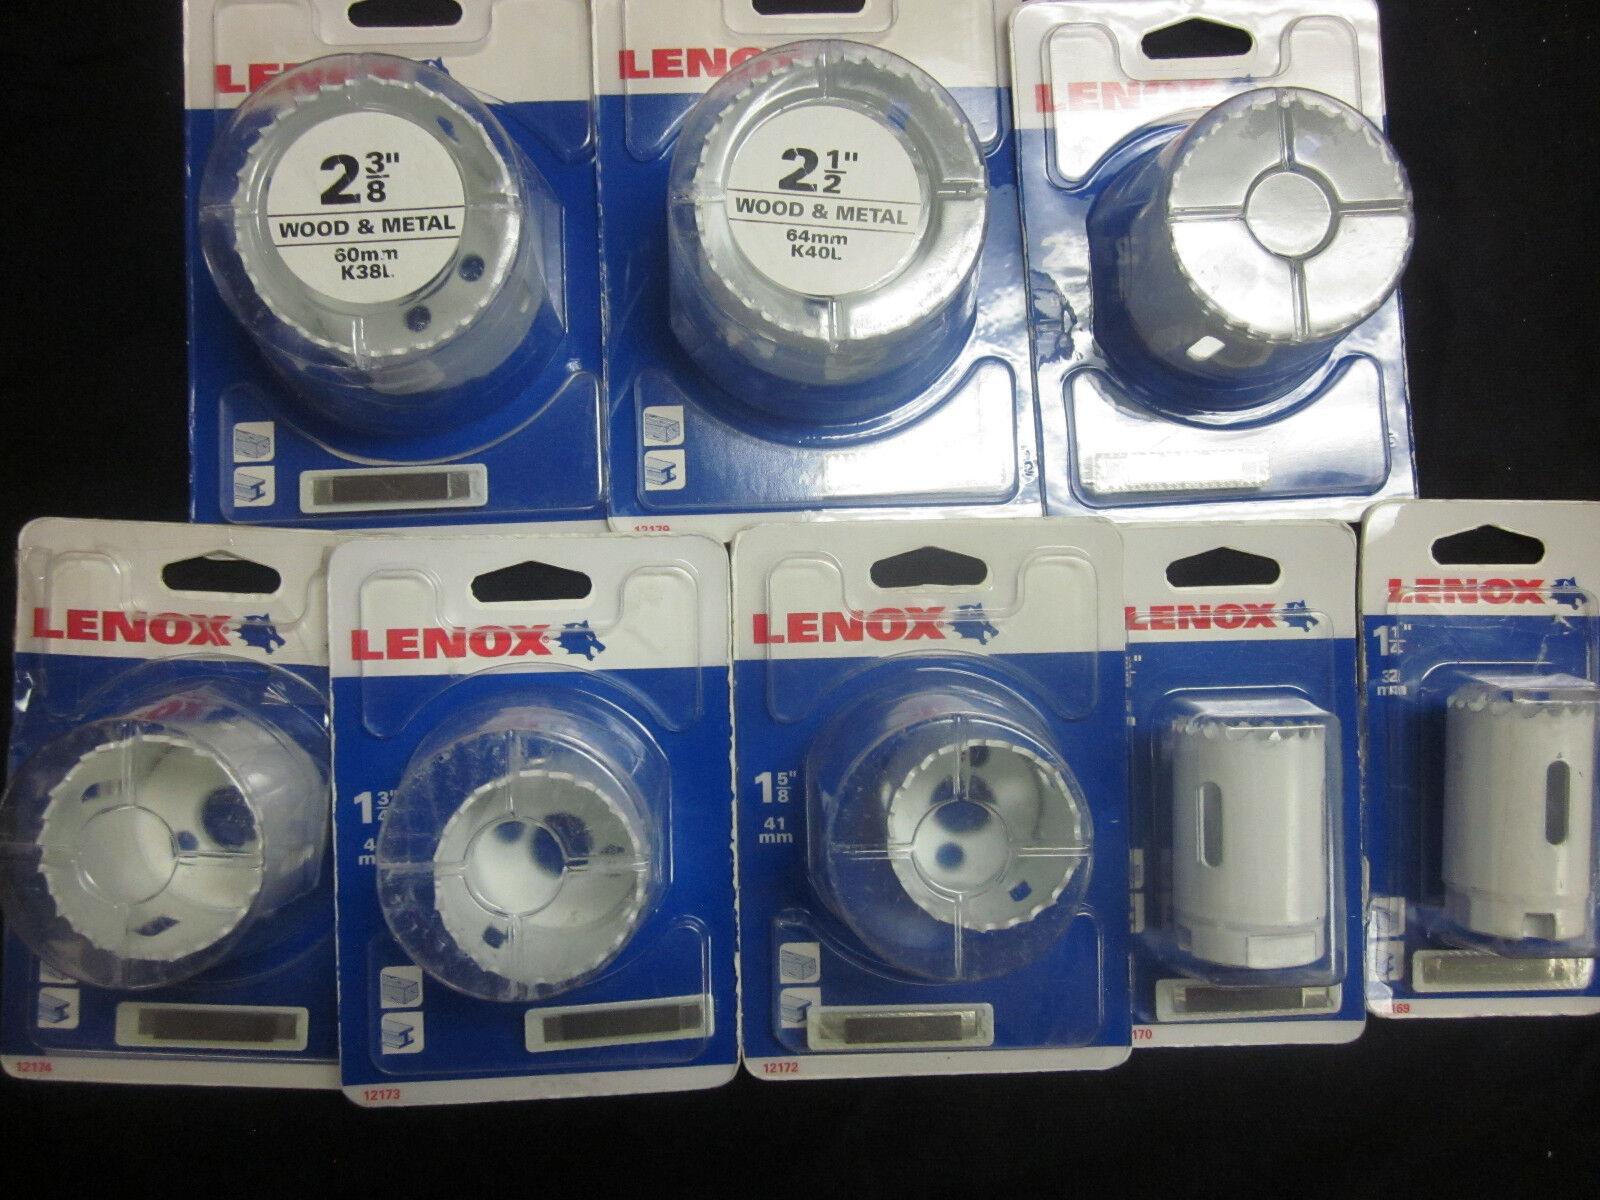 "8pc LENOX WOOD & METAL HOLE SAW SET 1-1/4"" TO 2-1/2"" ELECTRI"